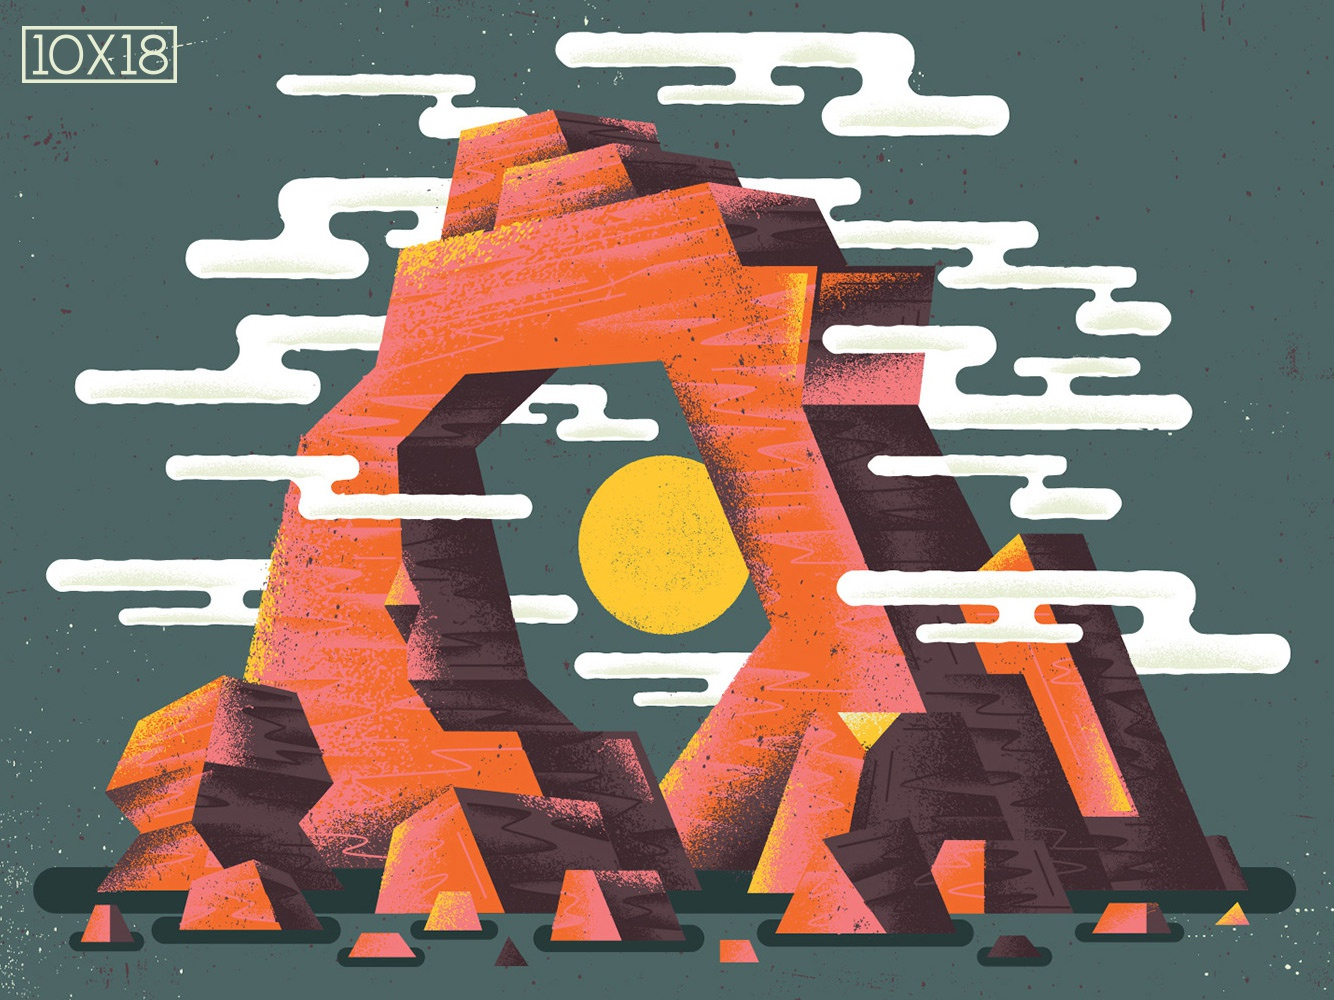 "10x18 Sumac ""Love in Shadow"" 10x18 album cover plateau metal pinnacle desert rock formation geology rock texture illustration"